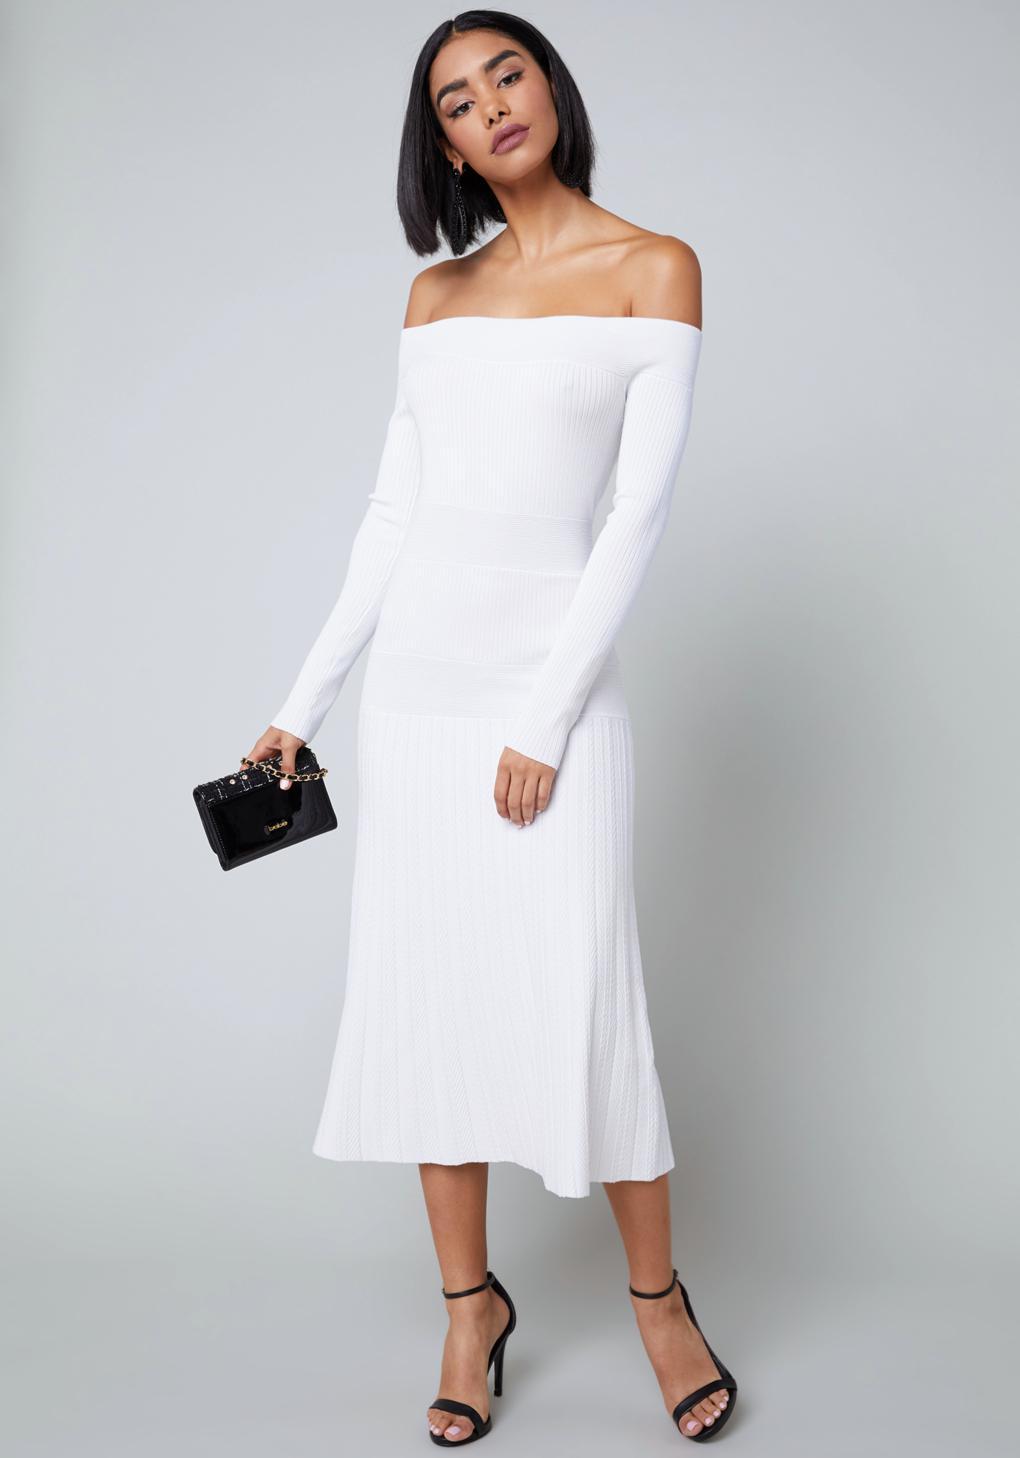 1080ecb7486b Lyst - Bebe Tatiana Sweater Dress in White